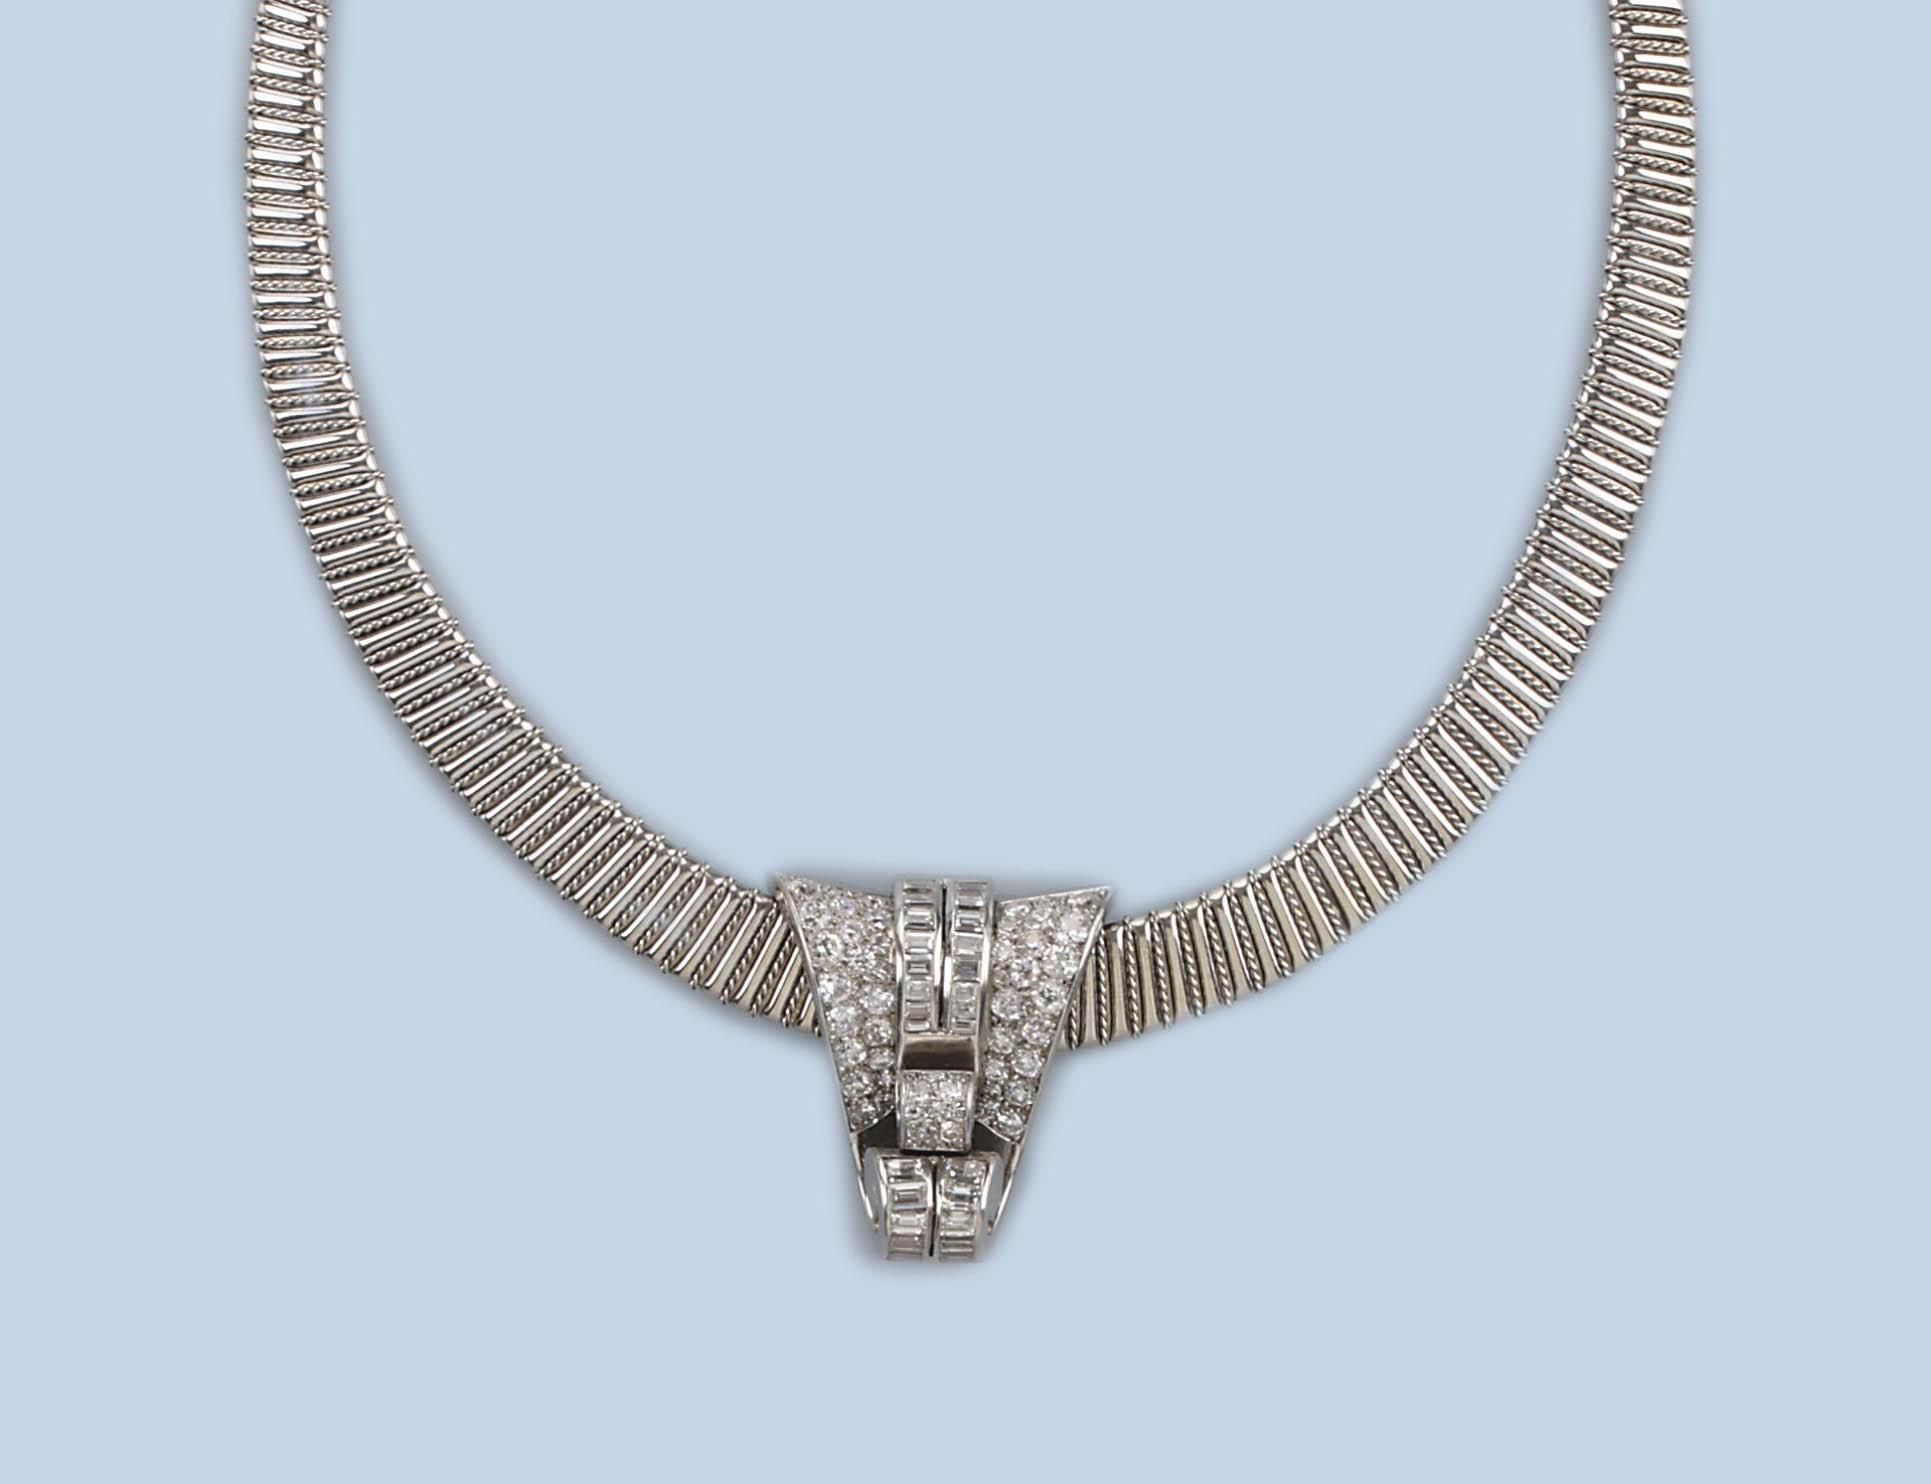 A PLATINUM AND DIAMOND CLIP, BY MELLERIO